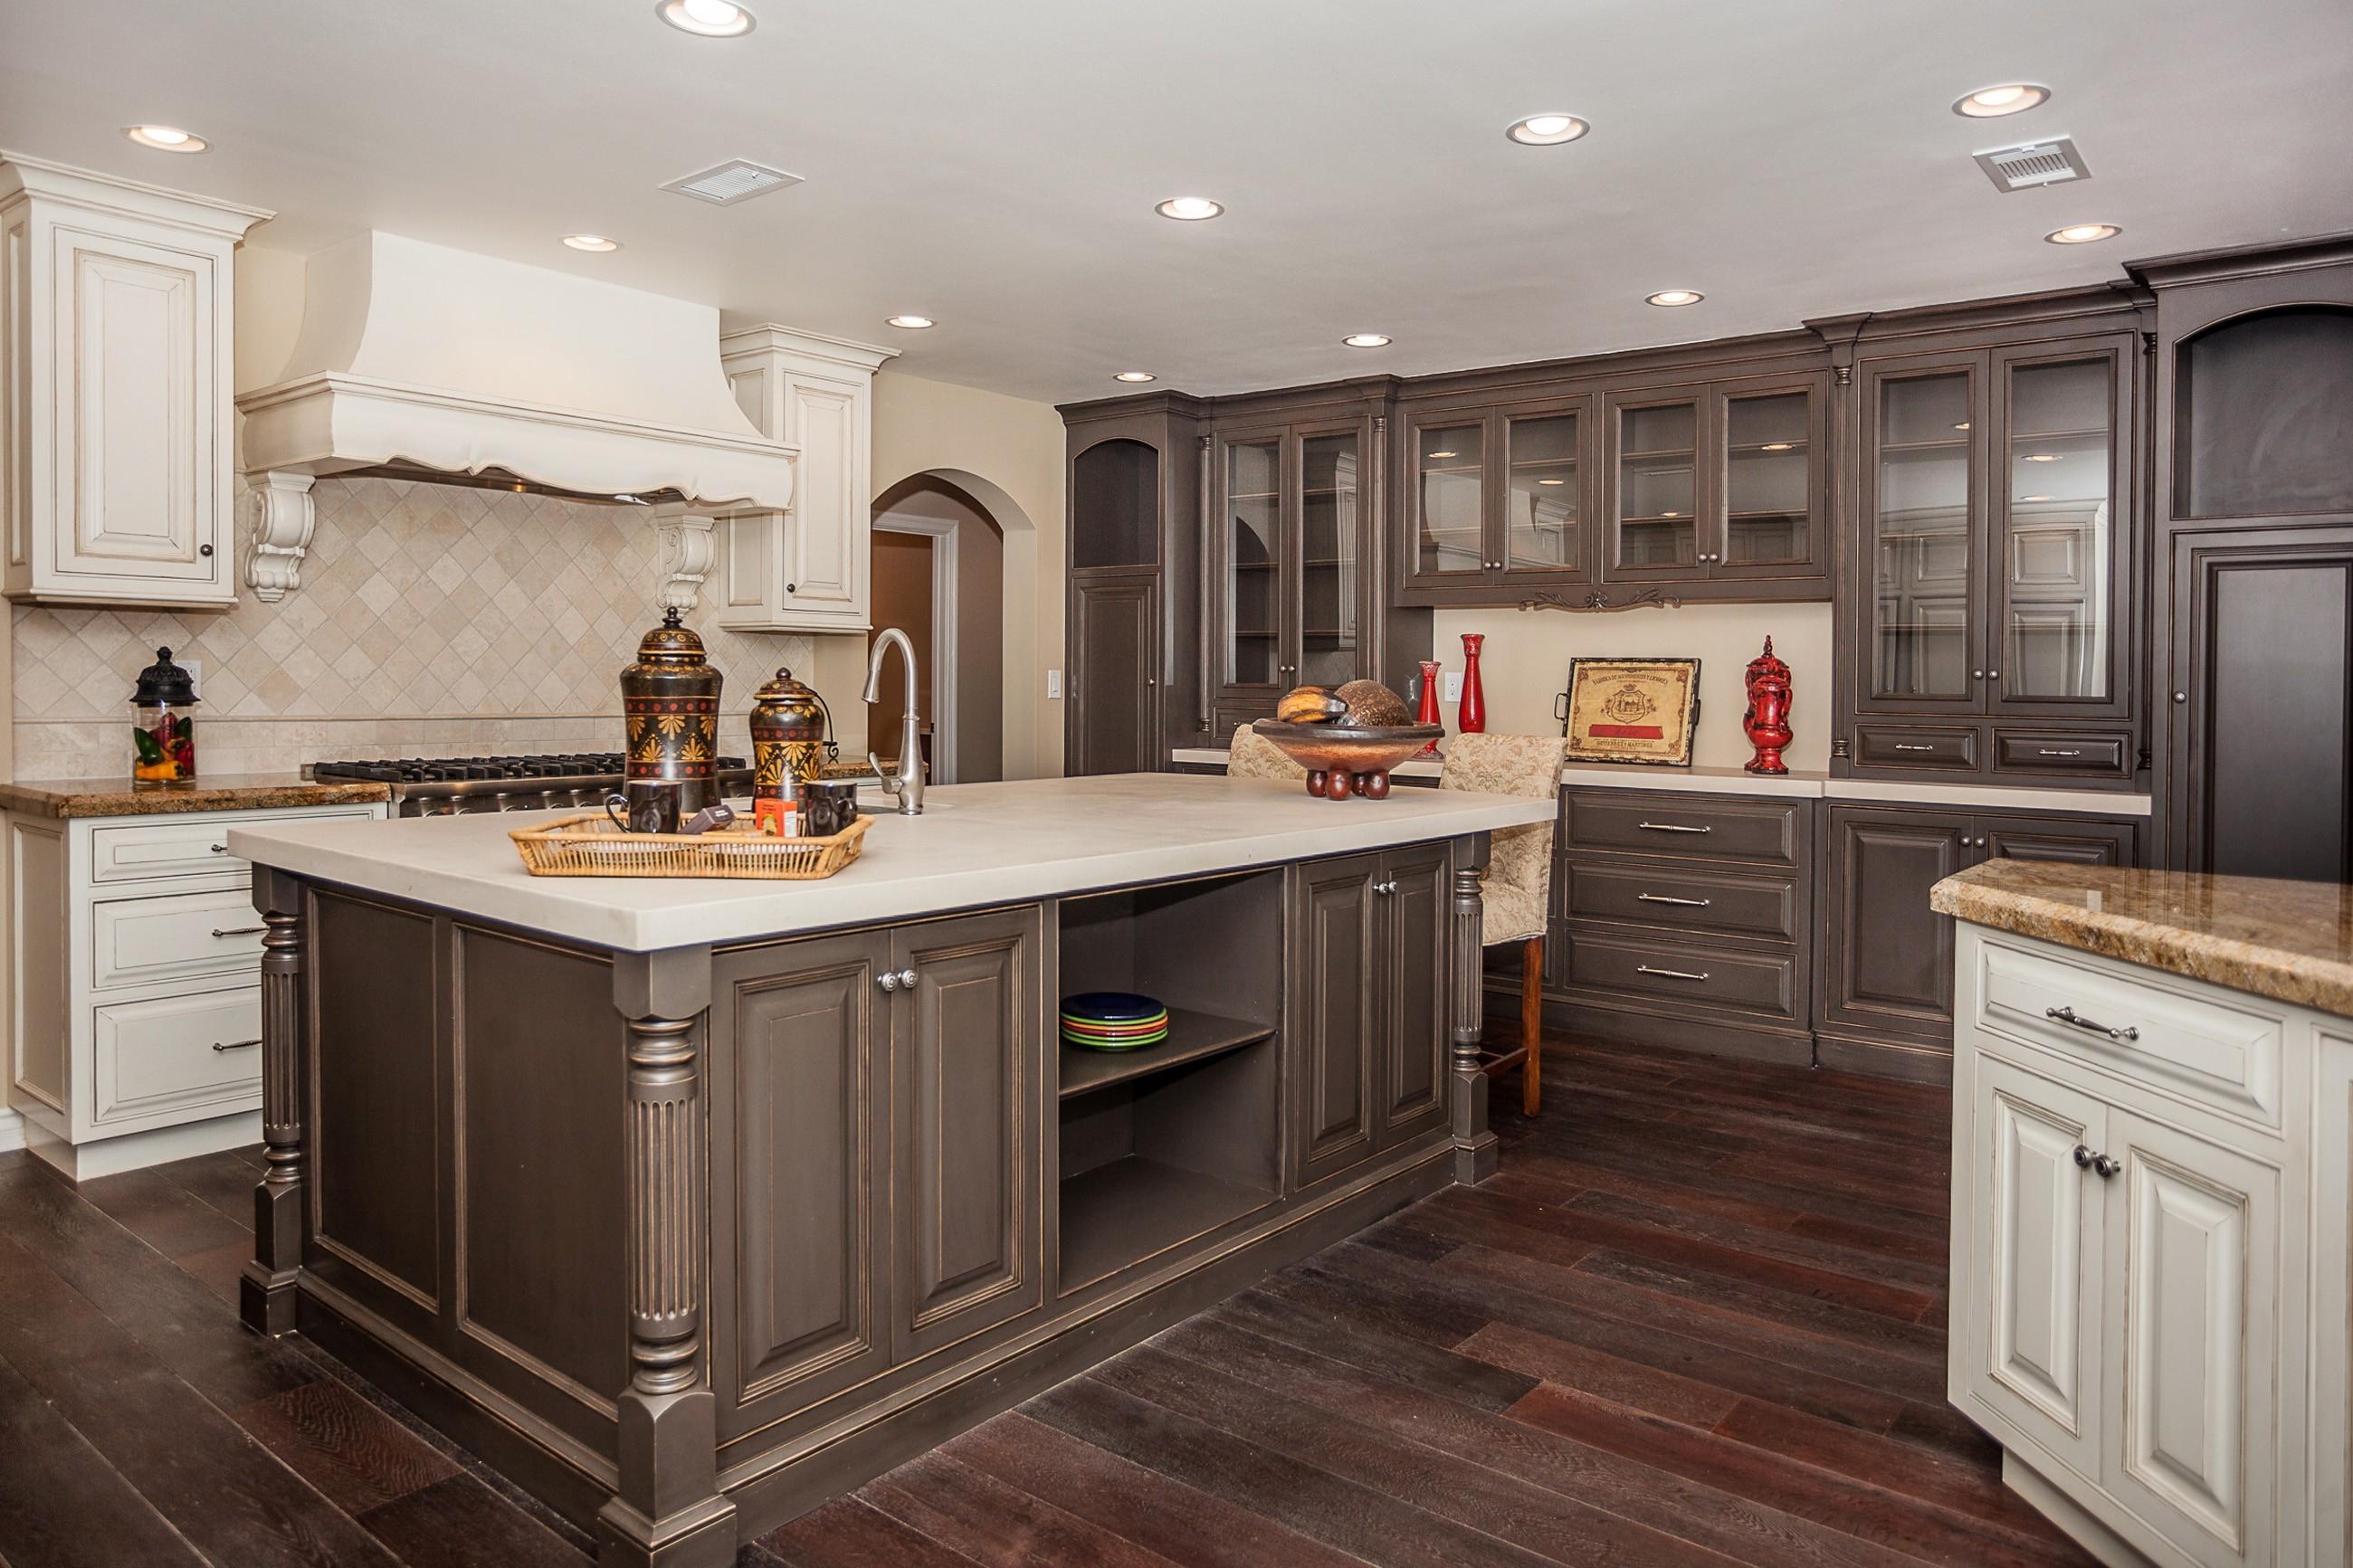 Kitchen Cabinets Refinishing Ideas Hawk Haven